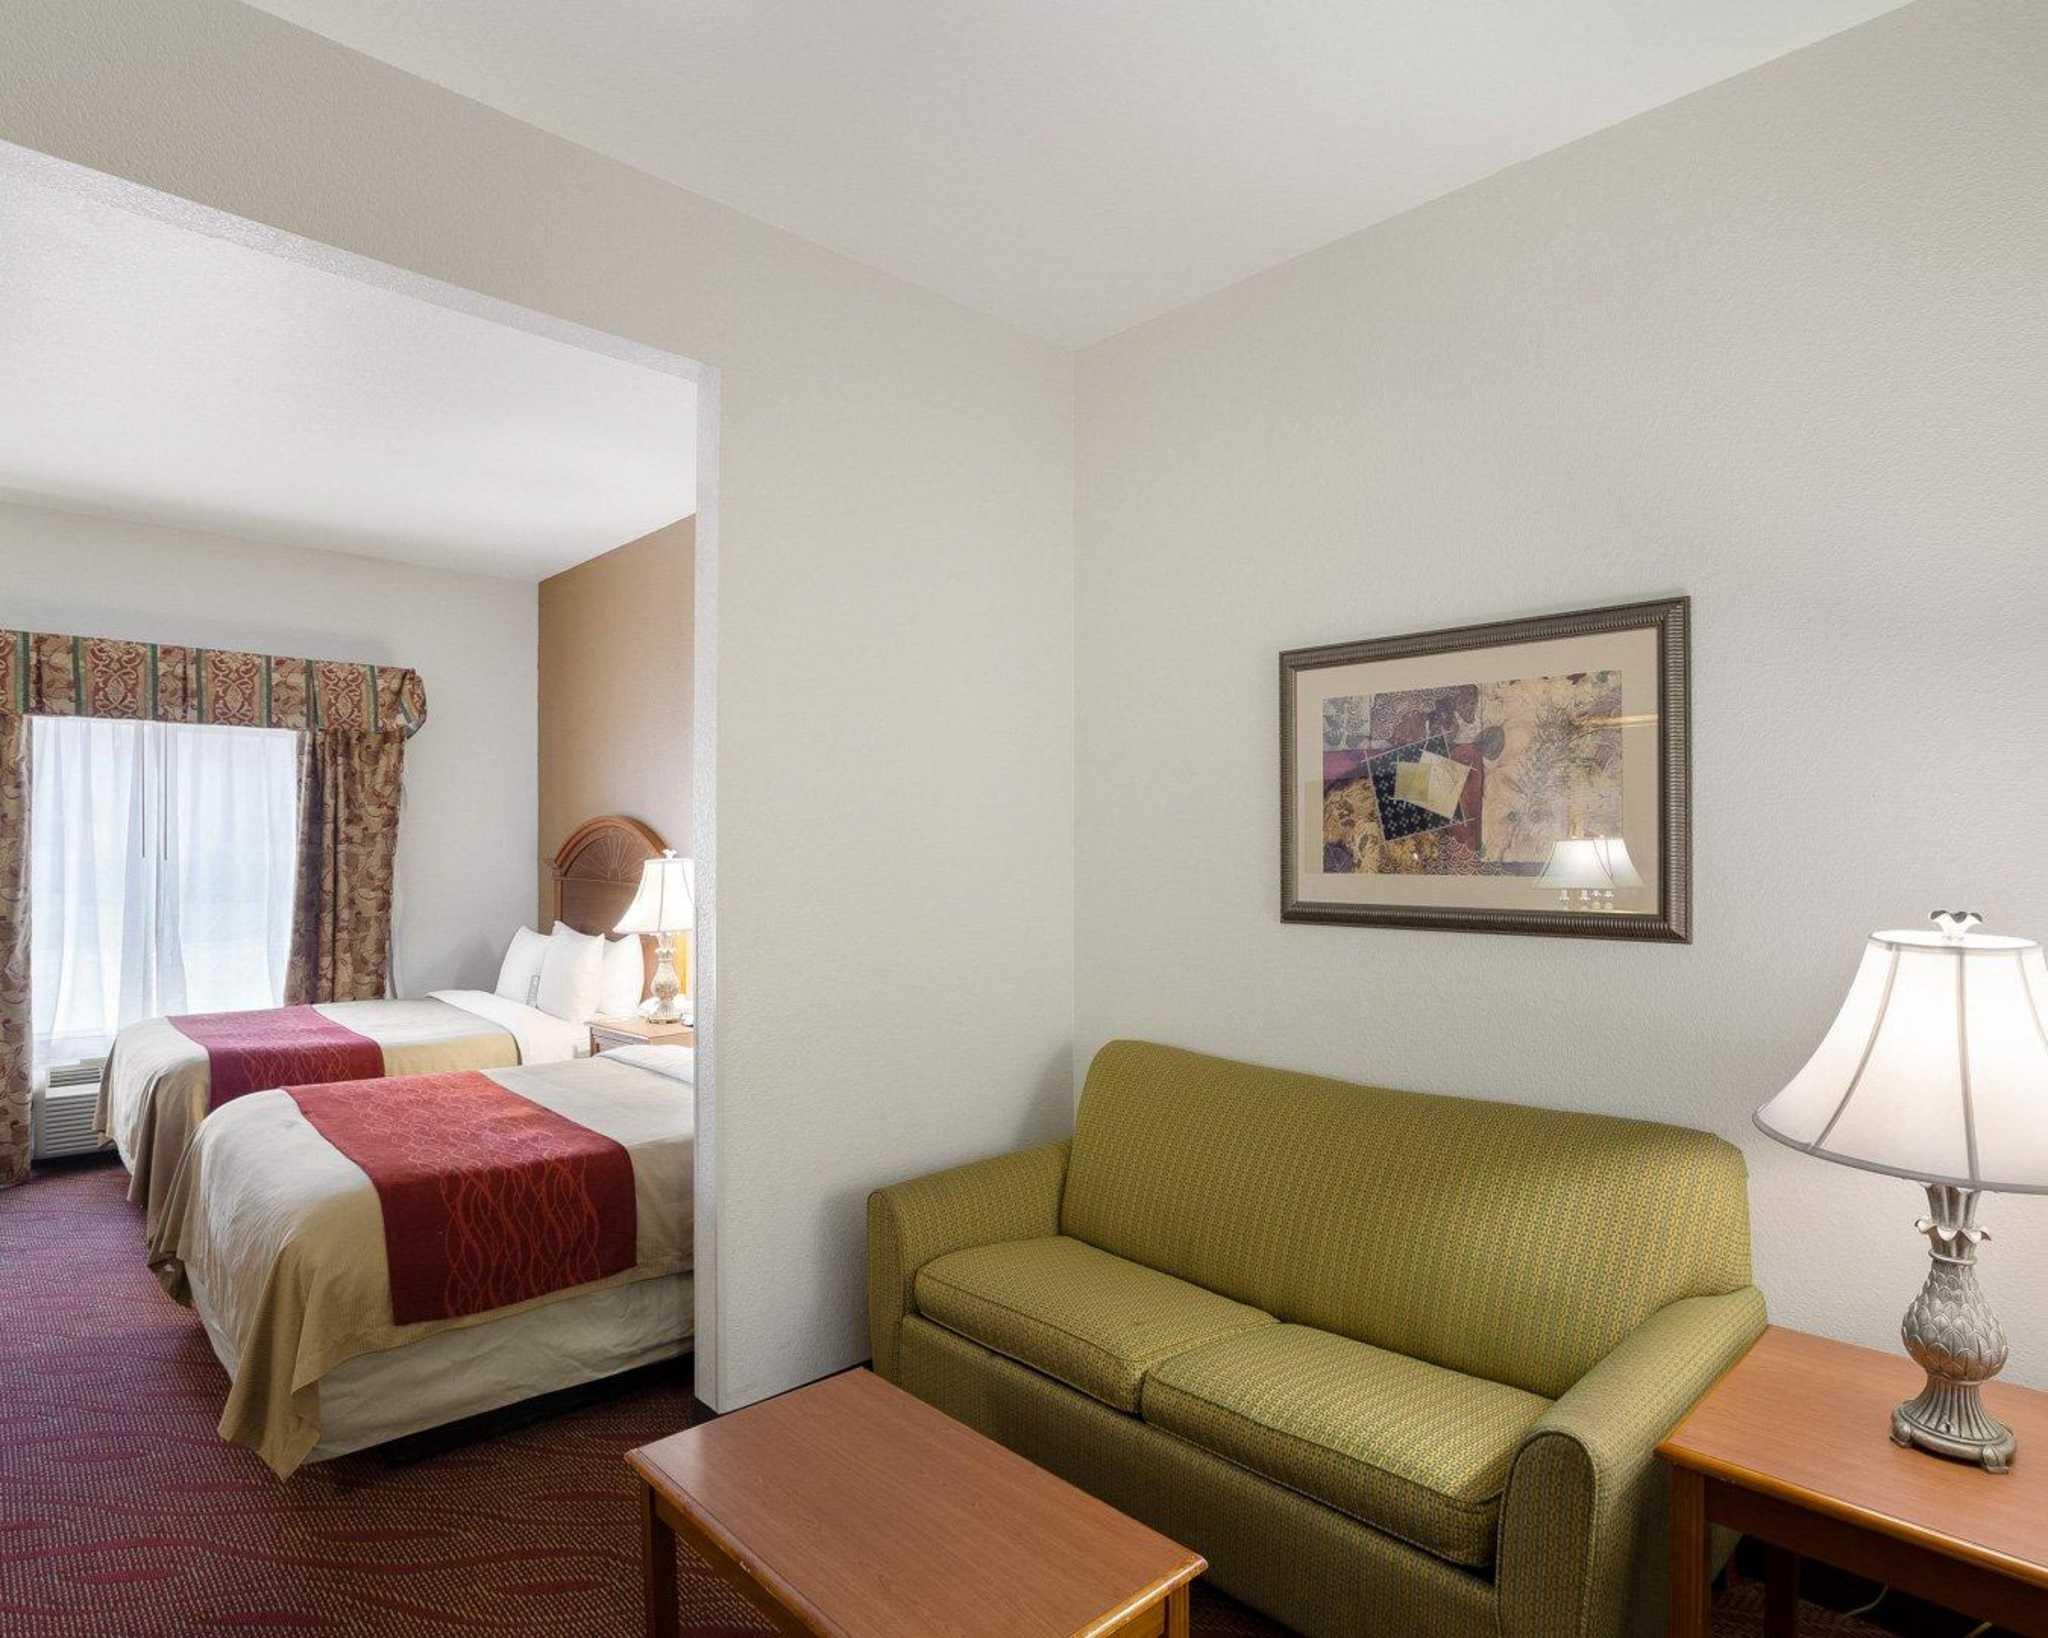 Comfort Inn & Suites Near Medical Center image 27